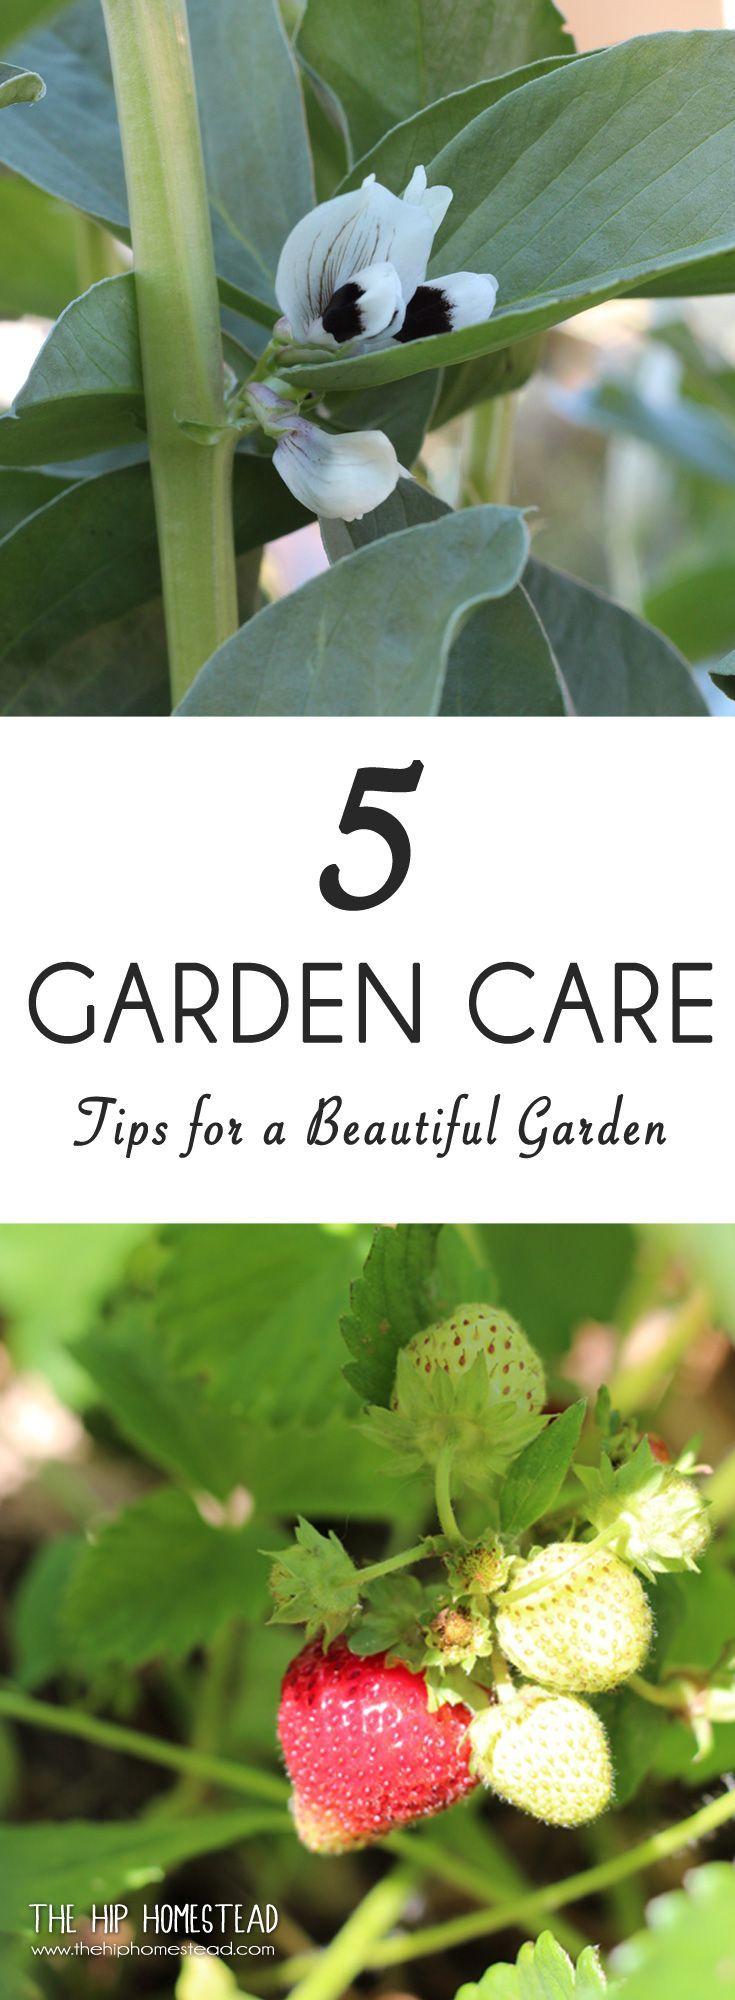 5 Gardening Care Tips